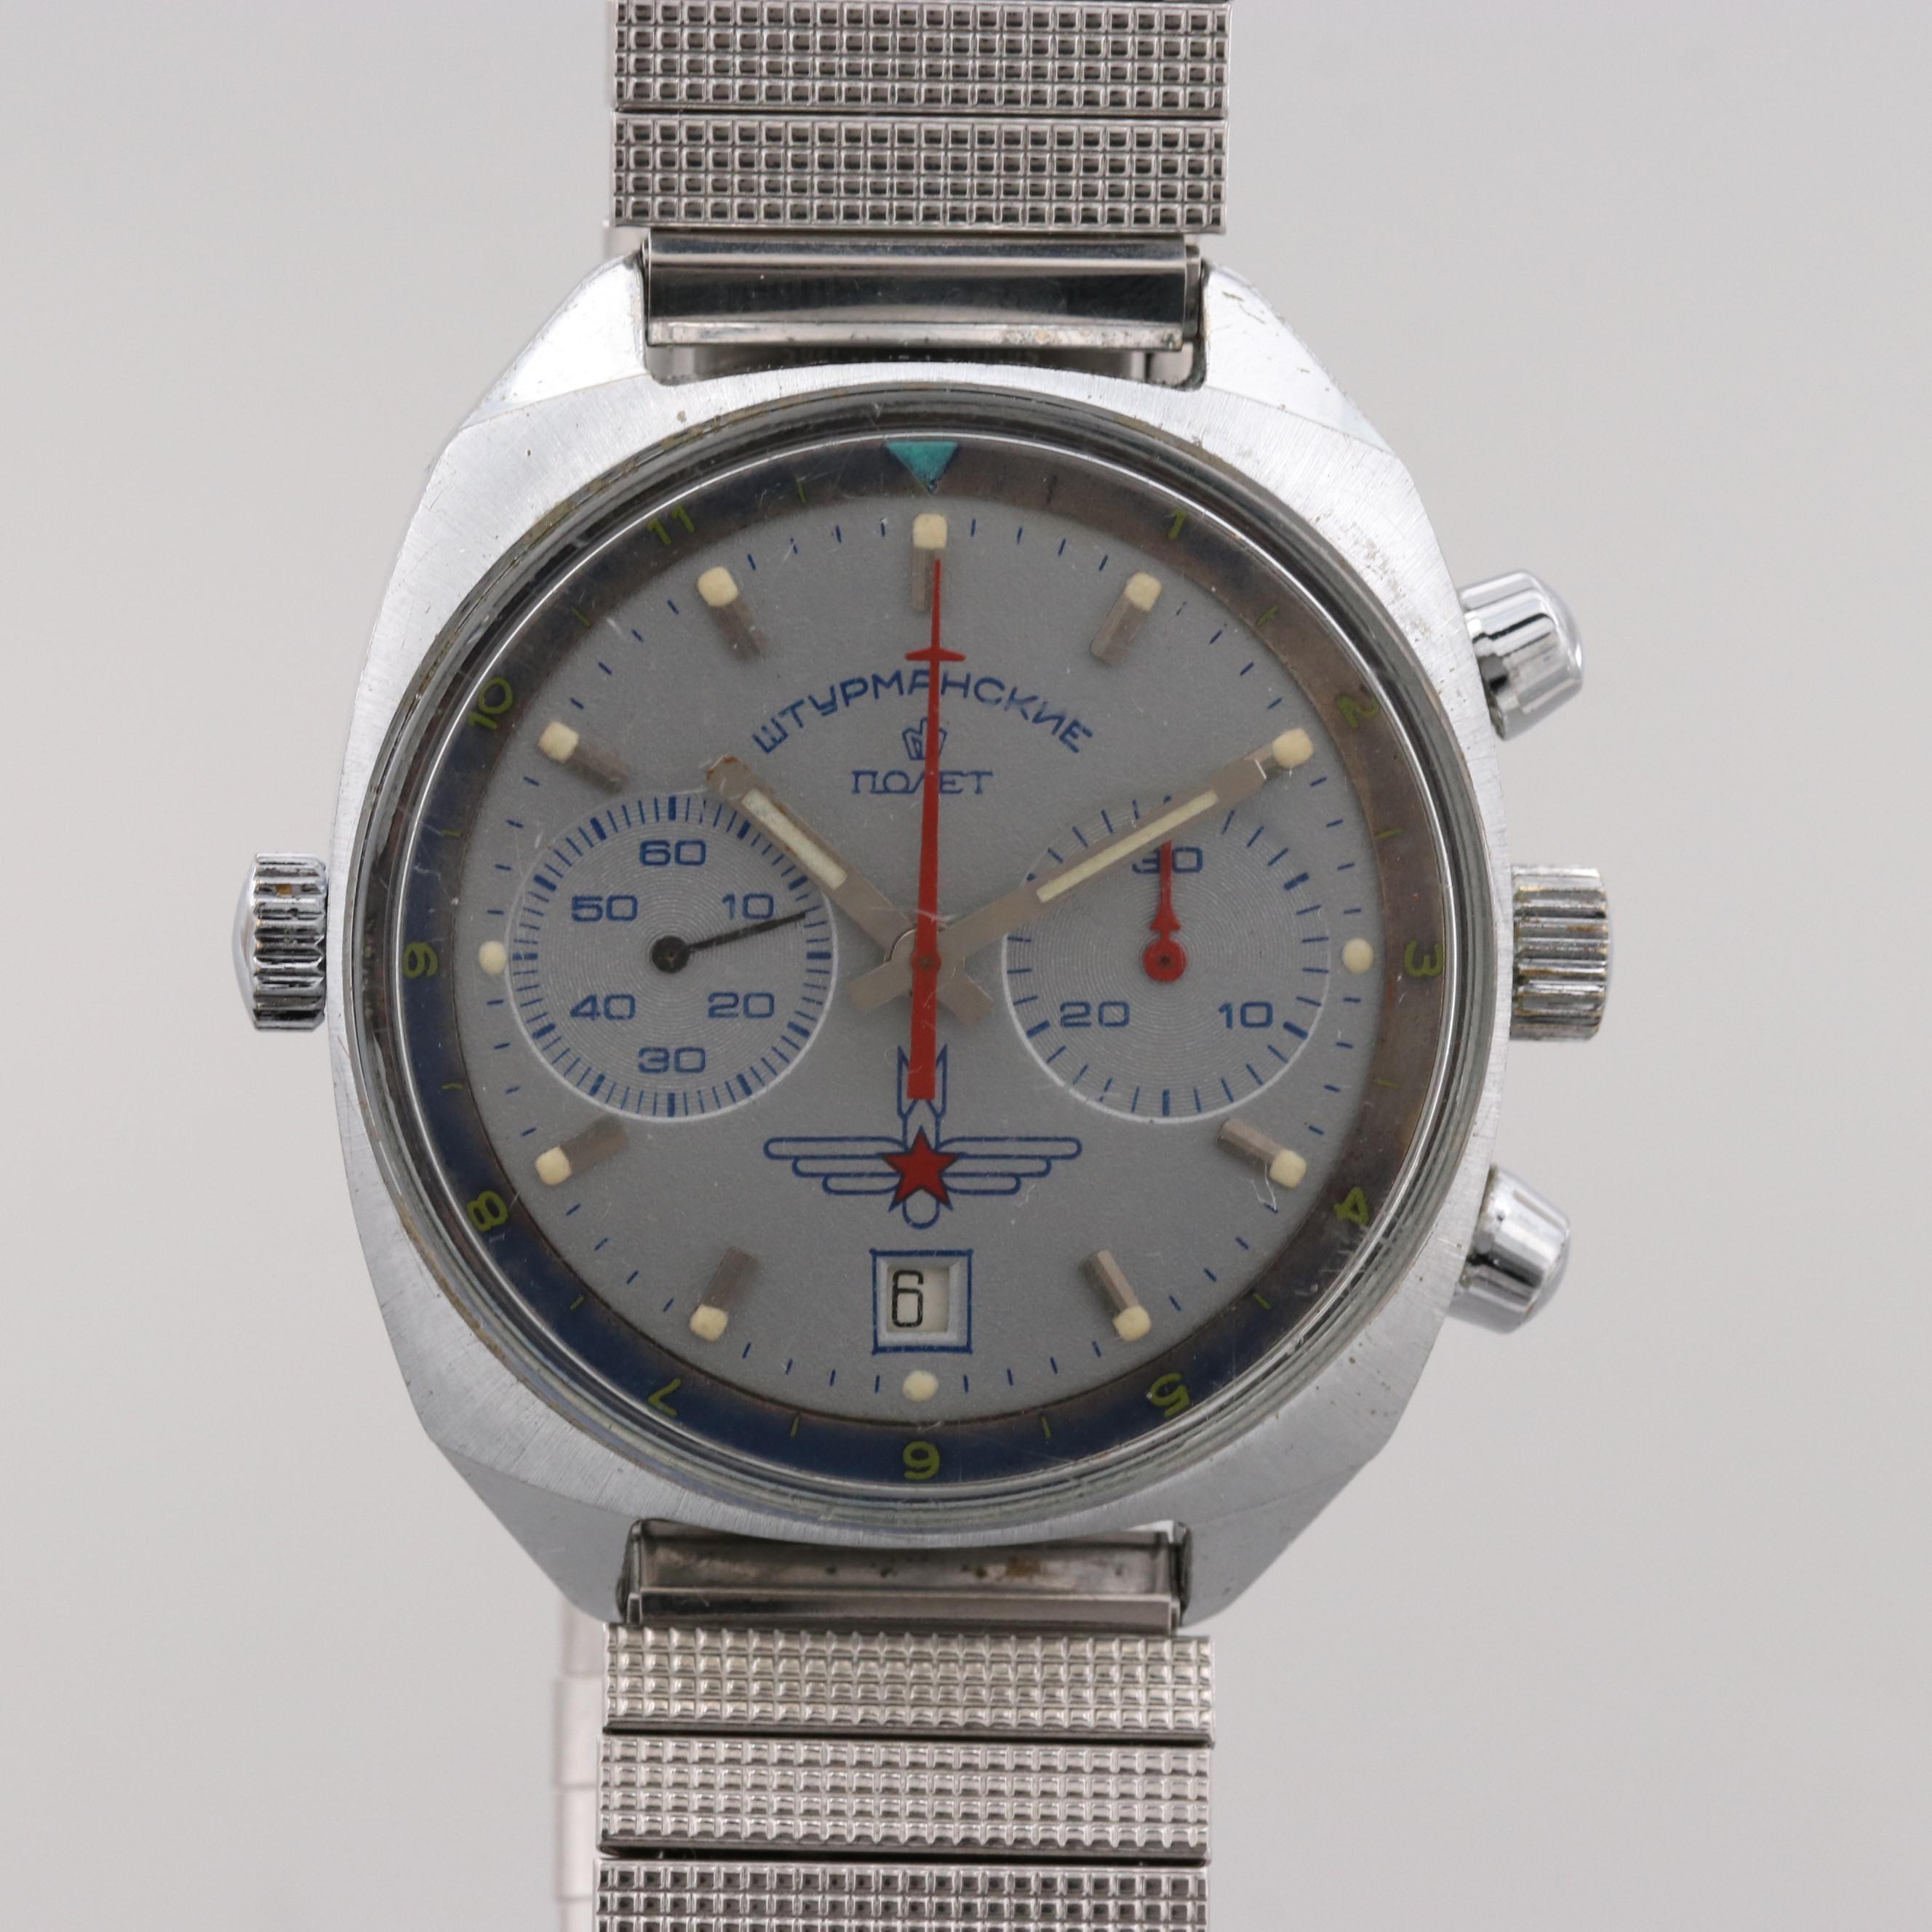 Vintage Soviet Russian Poljot Sturmanski Chrono Wristwatch, 1990